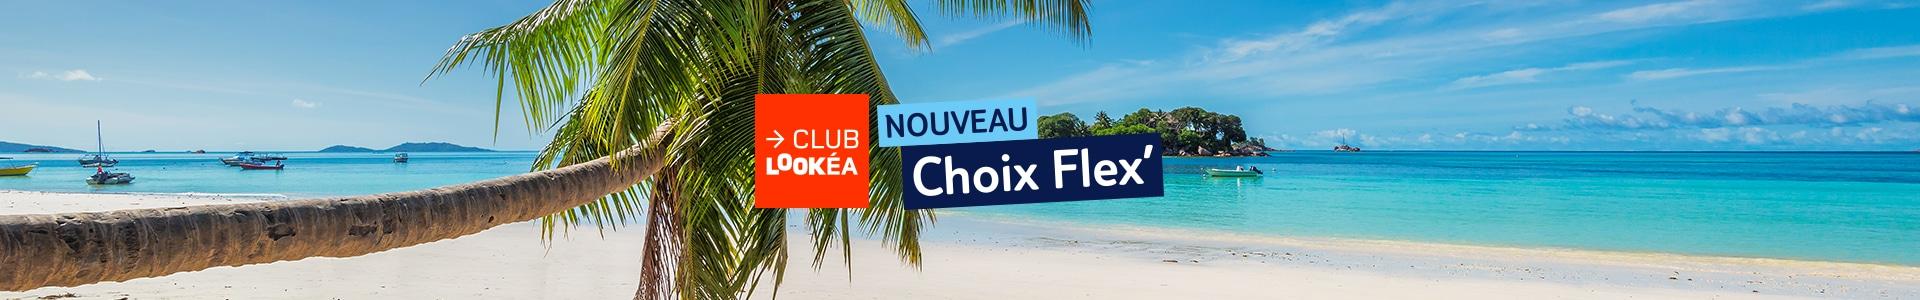 Club Lookéa lointains en Choix Flex